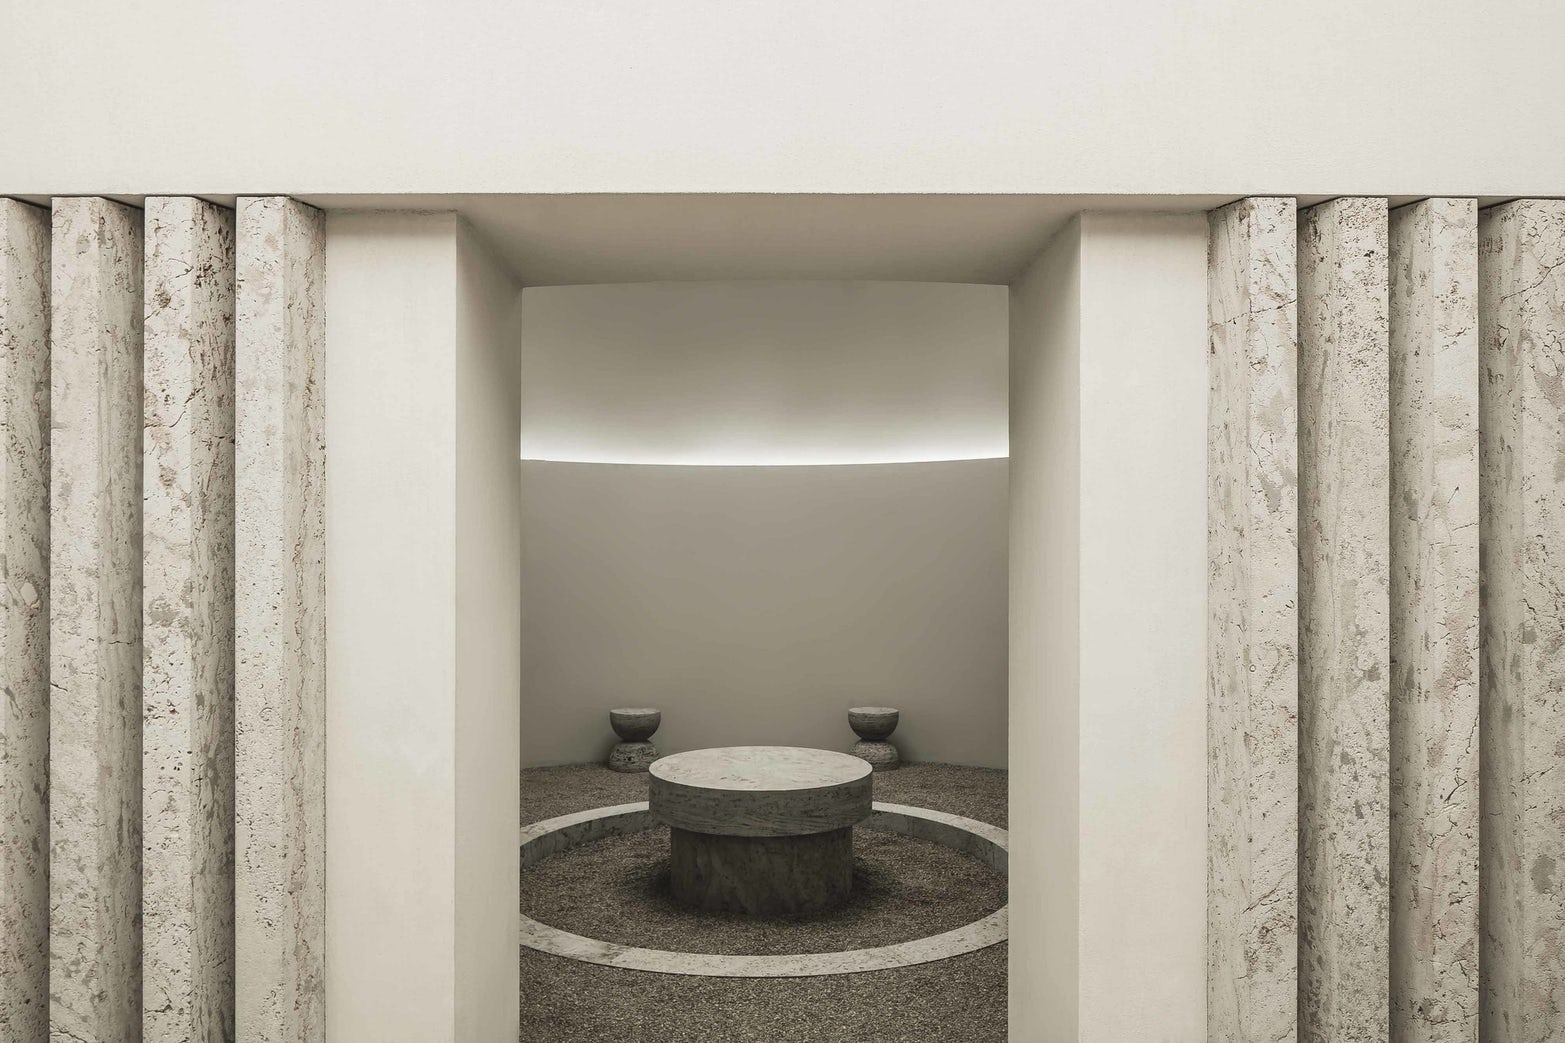 Nicolas Schuybroek Spaces of Objects Hullebusch Biennale Interieur 10